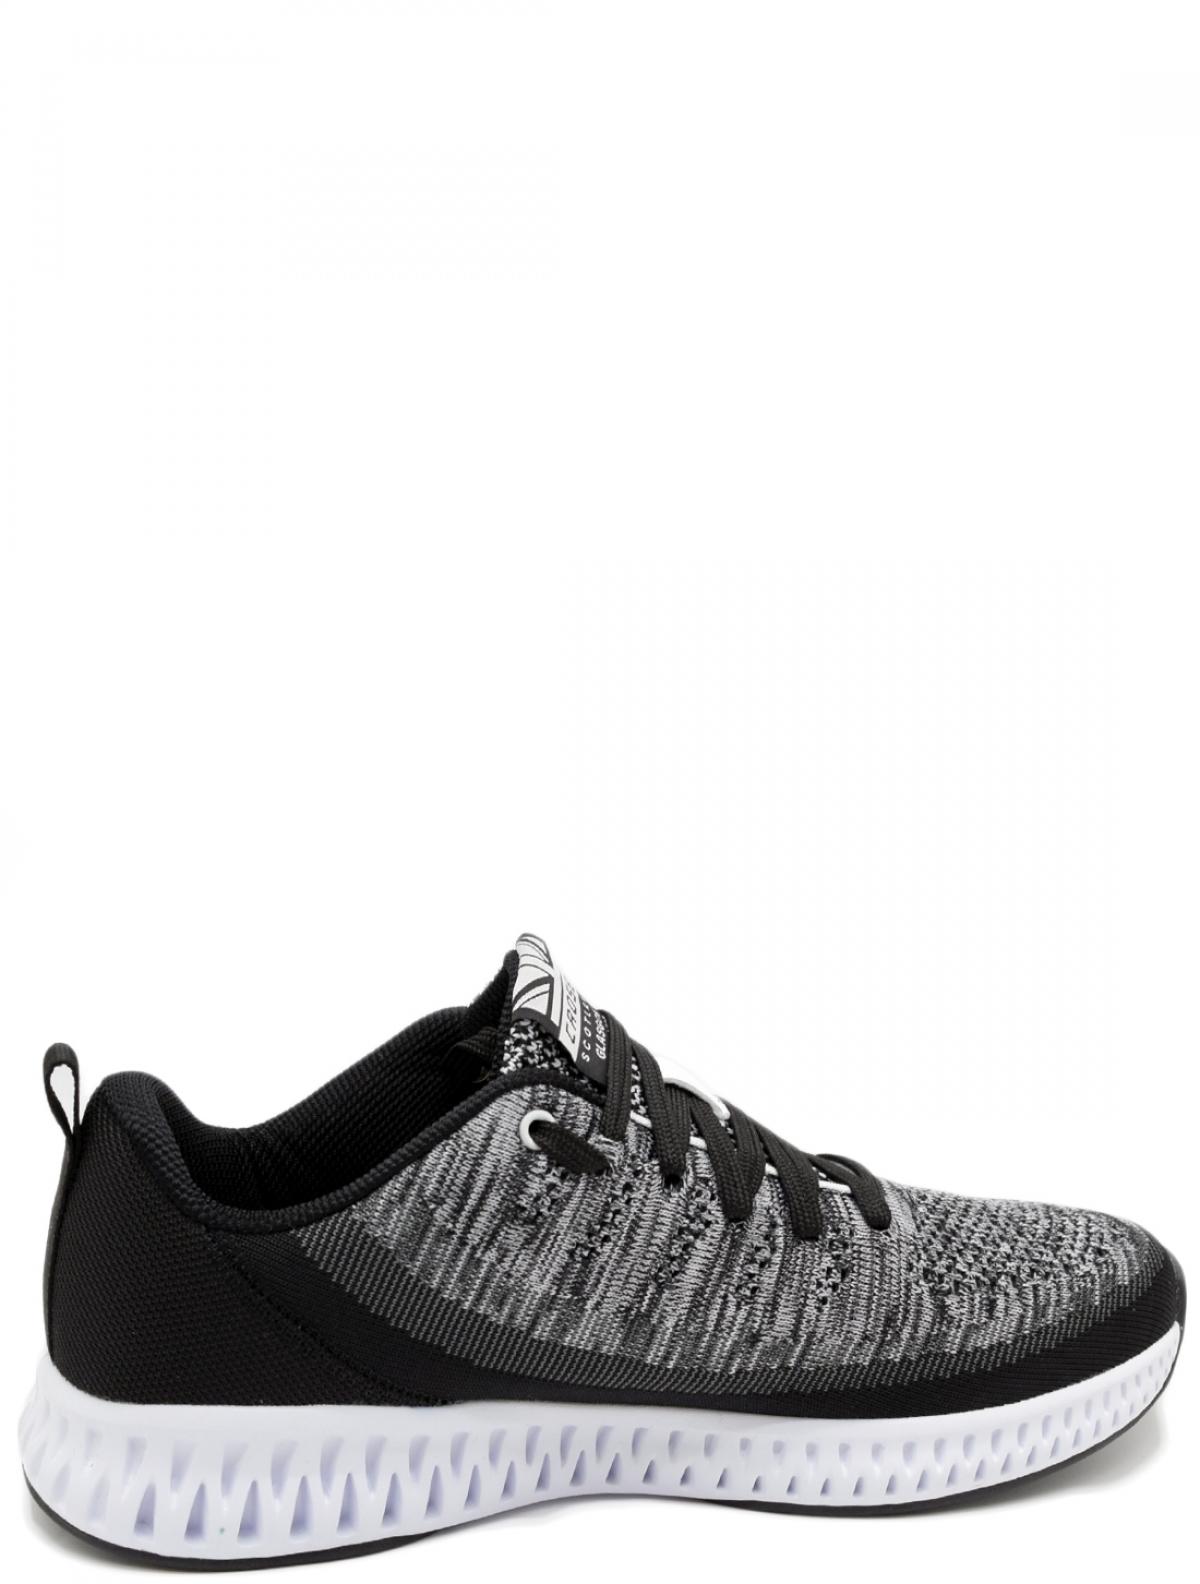 CROSBY 497200/01-02 мужские кроссовки